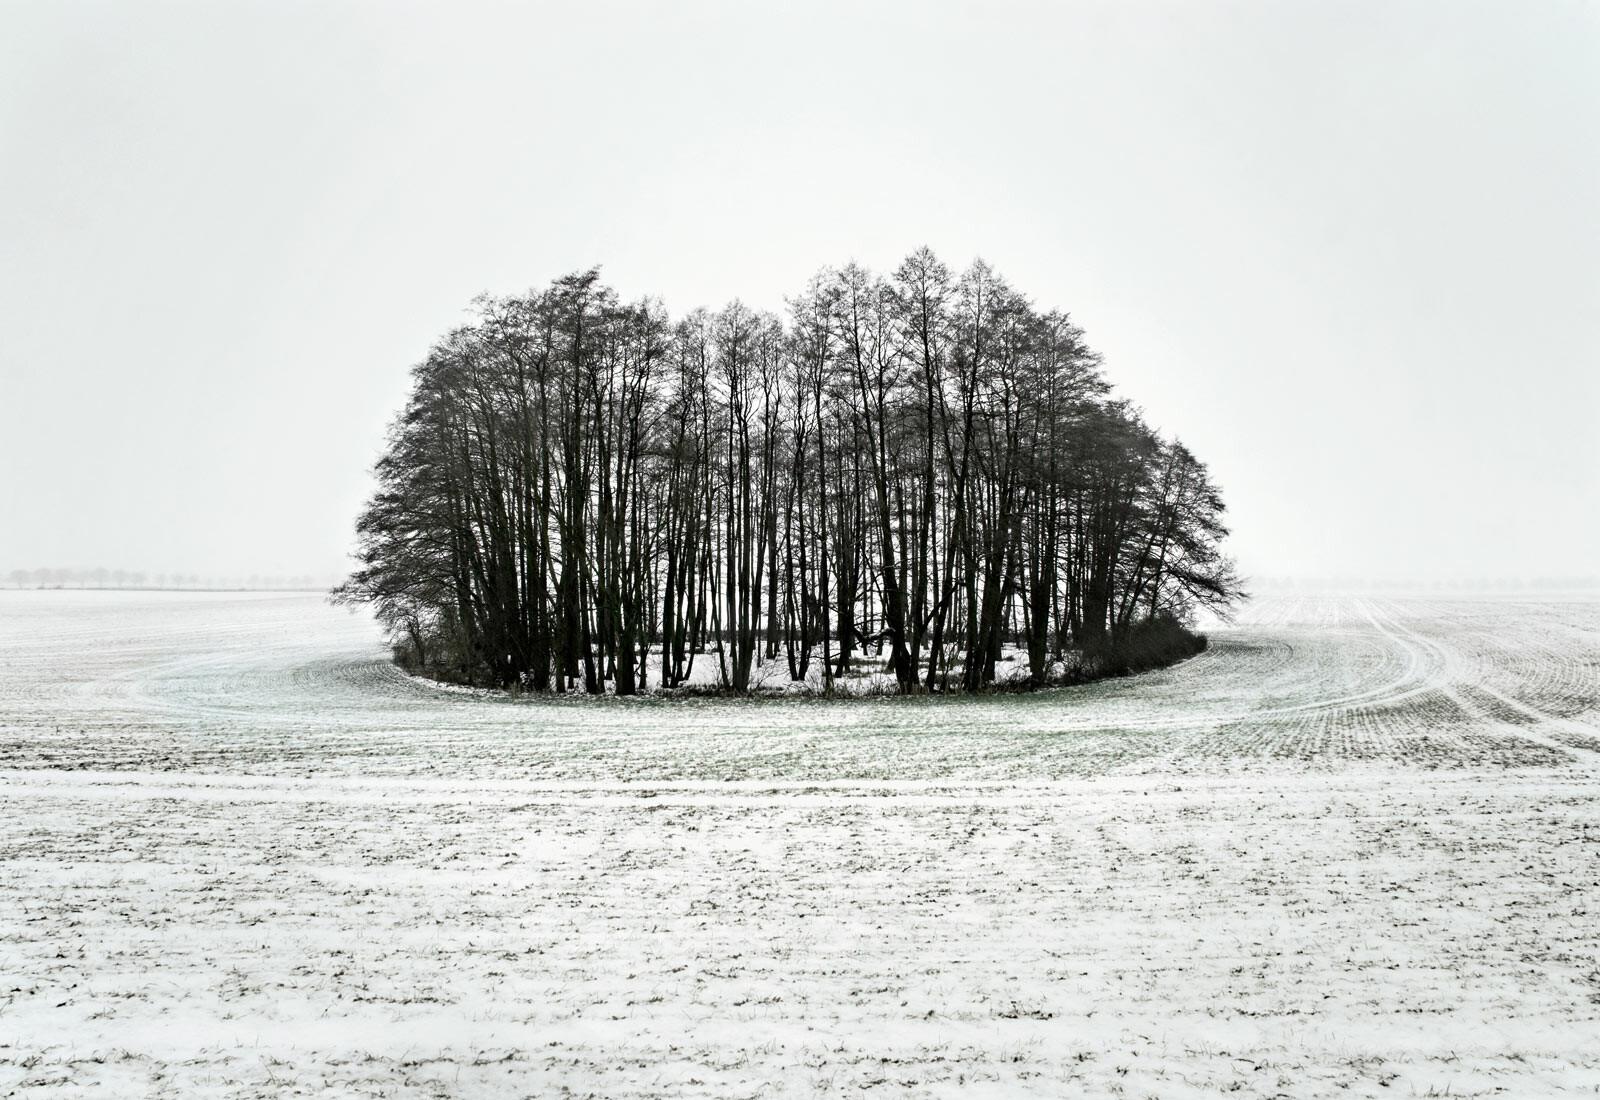 Island 1 - Hartwig Klappert